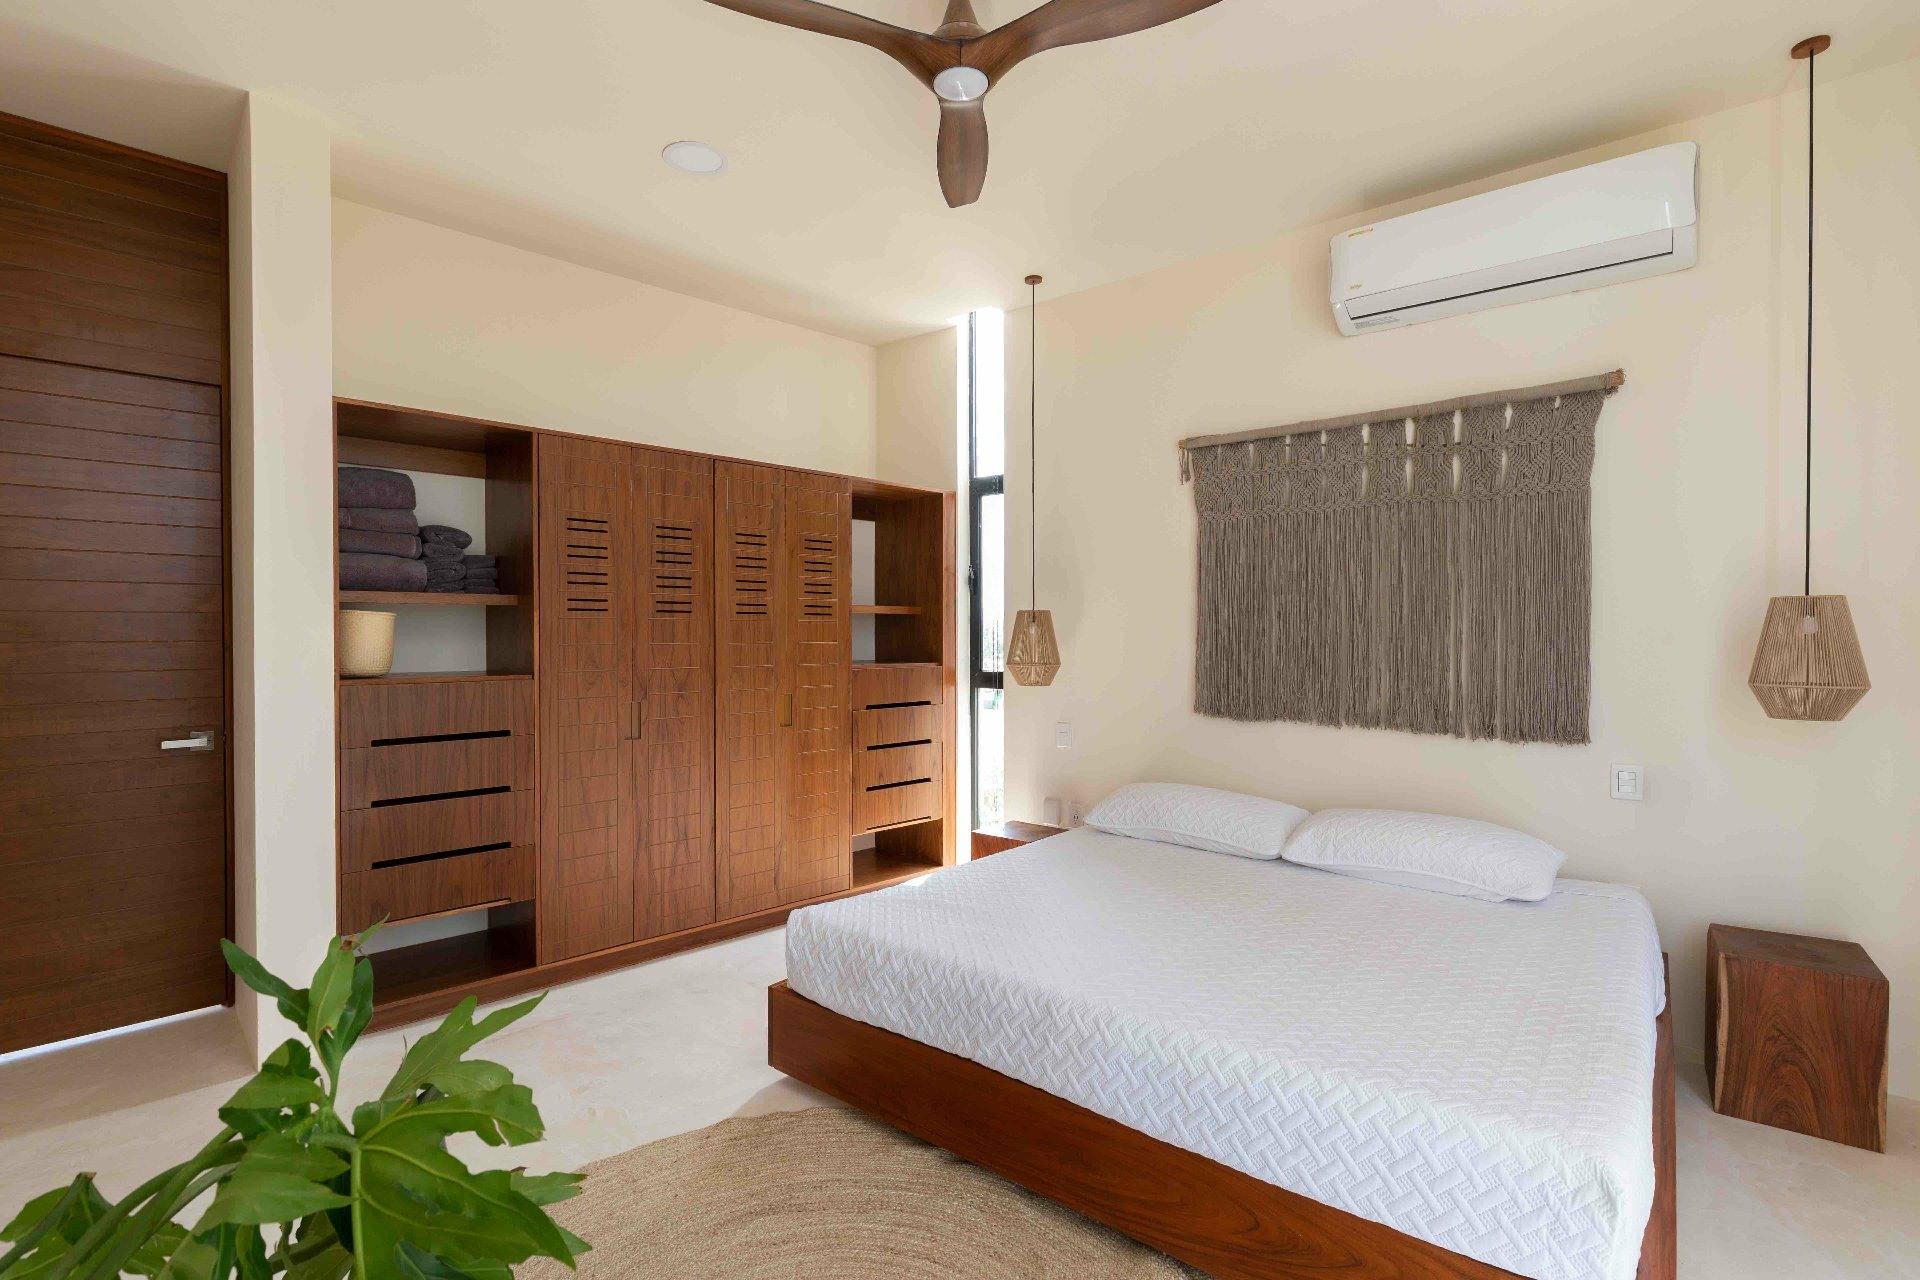 image 6 - Apartment For sale Autres pays - 7 rooms